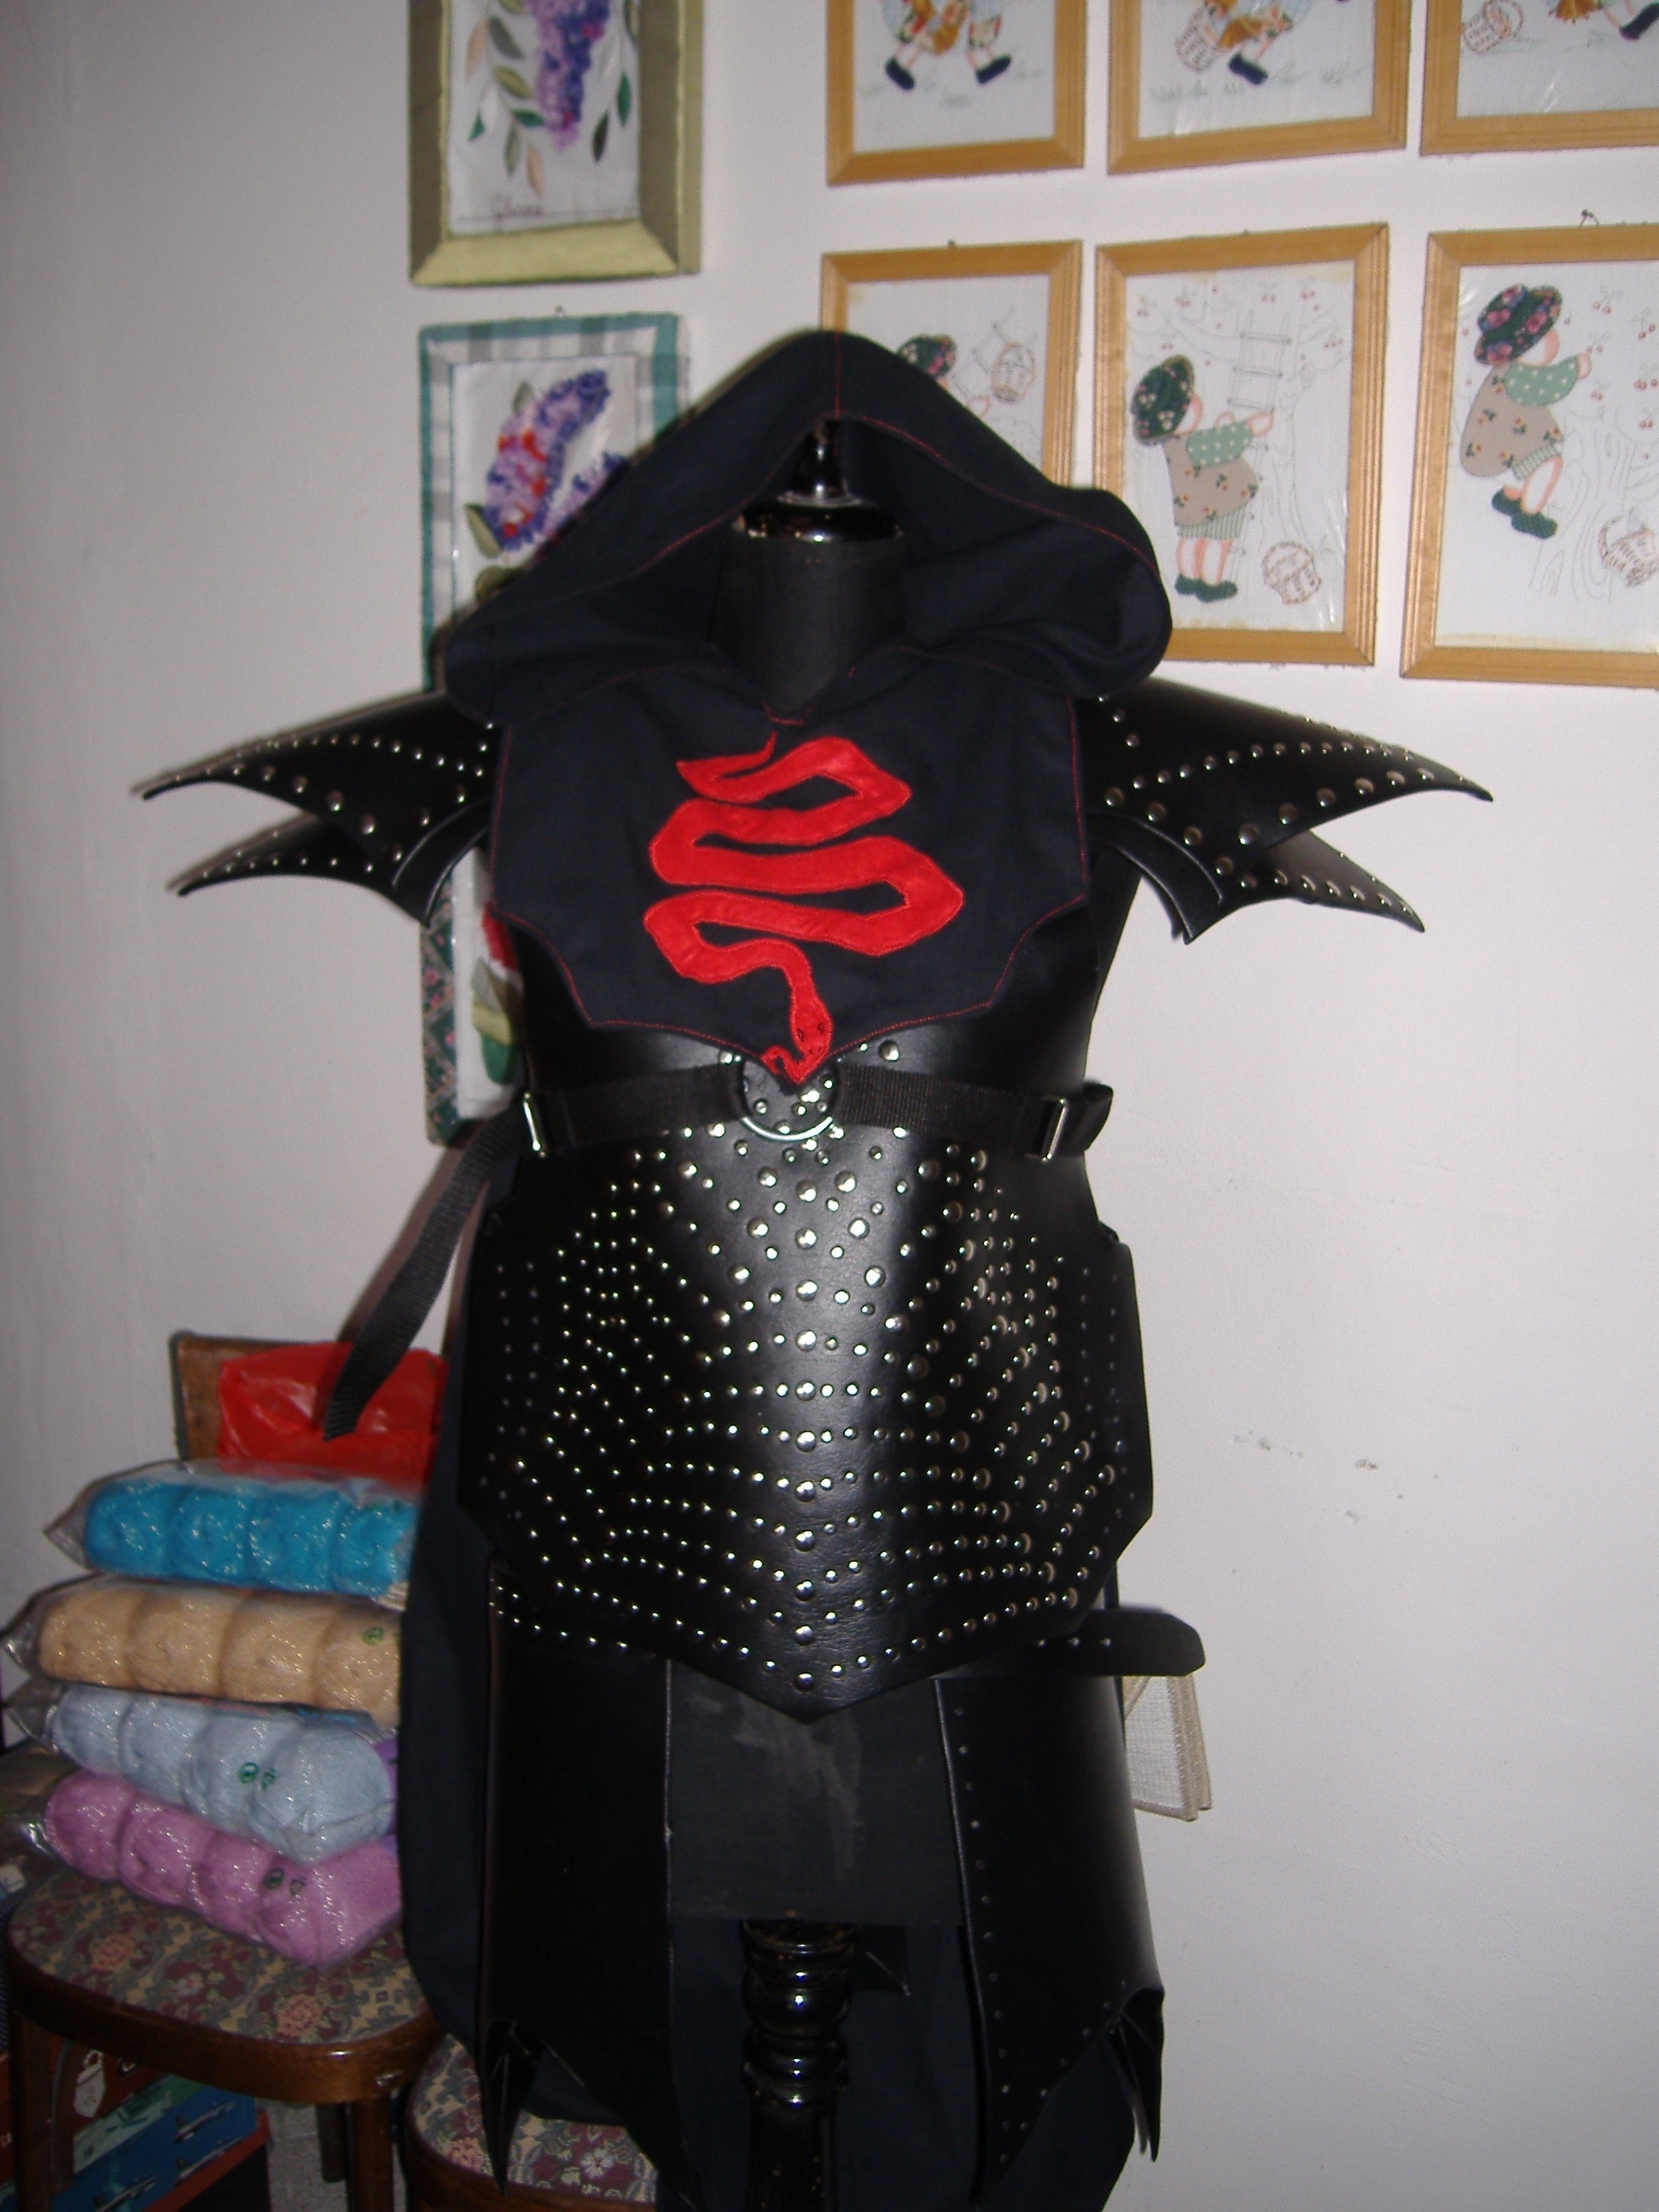 DarkElf Studded Leather Armour by Nightjar666 on DeviantArt